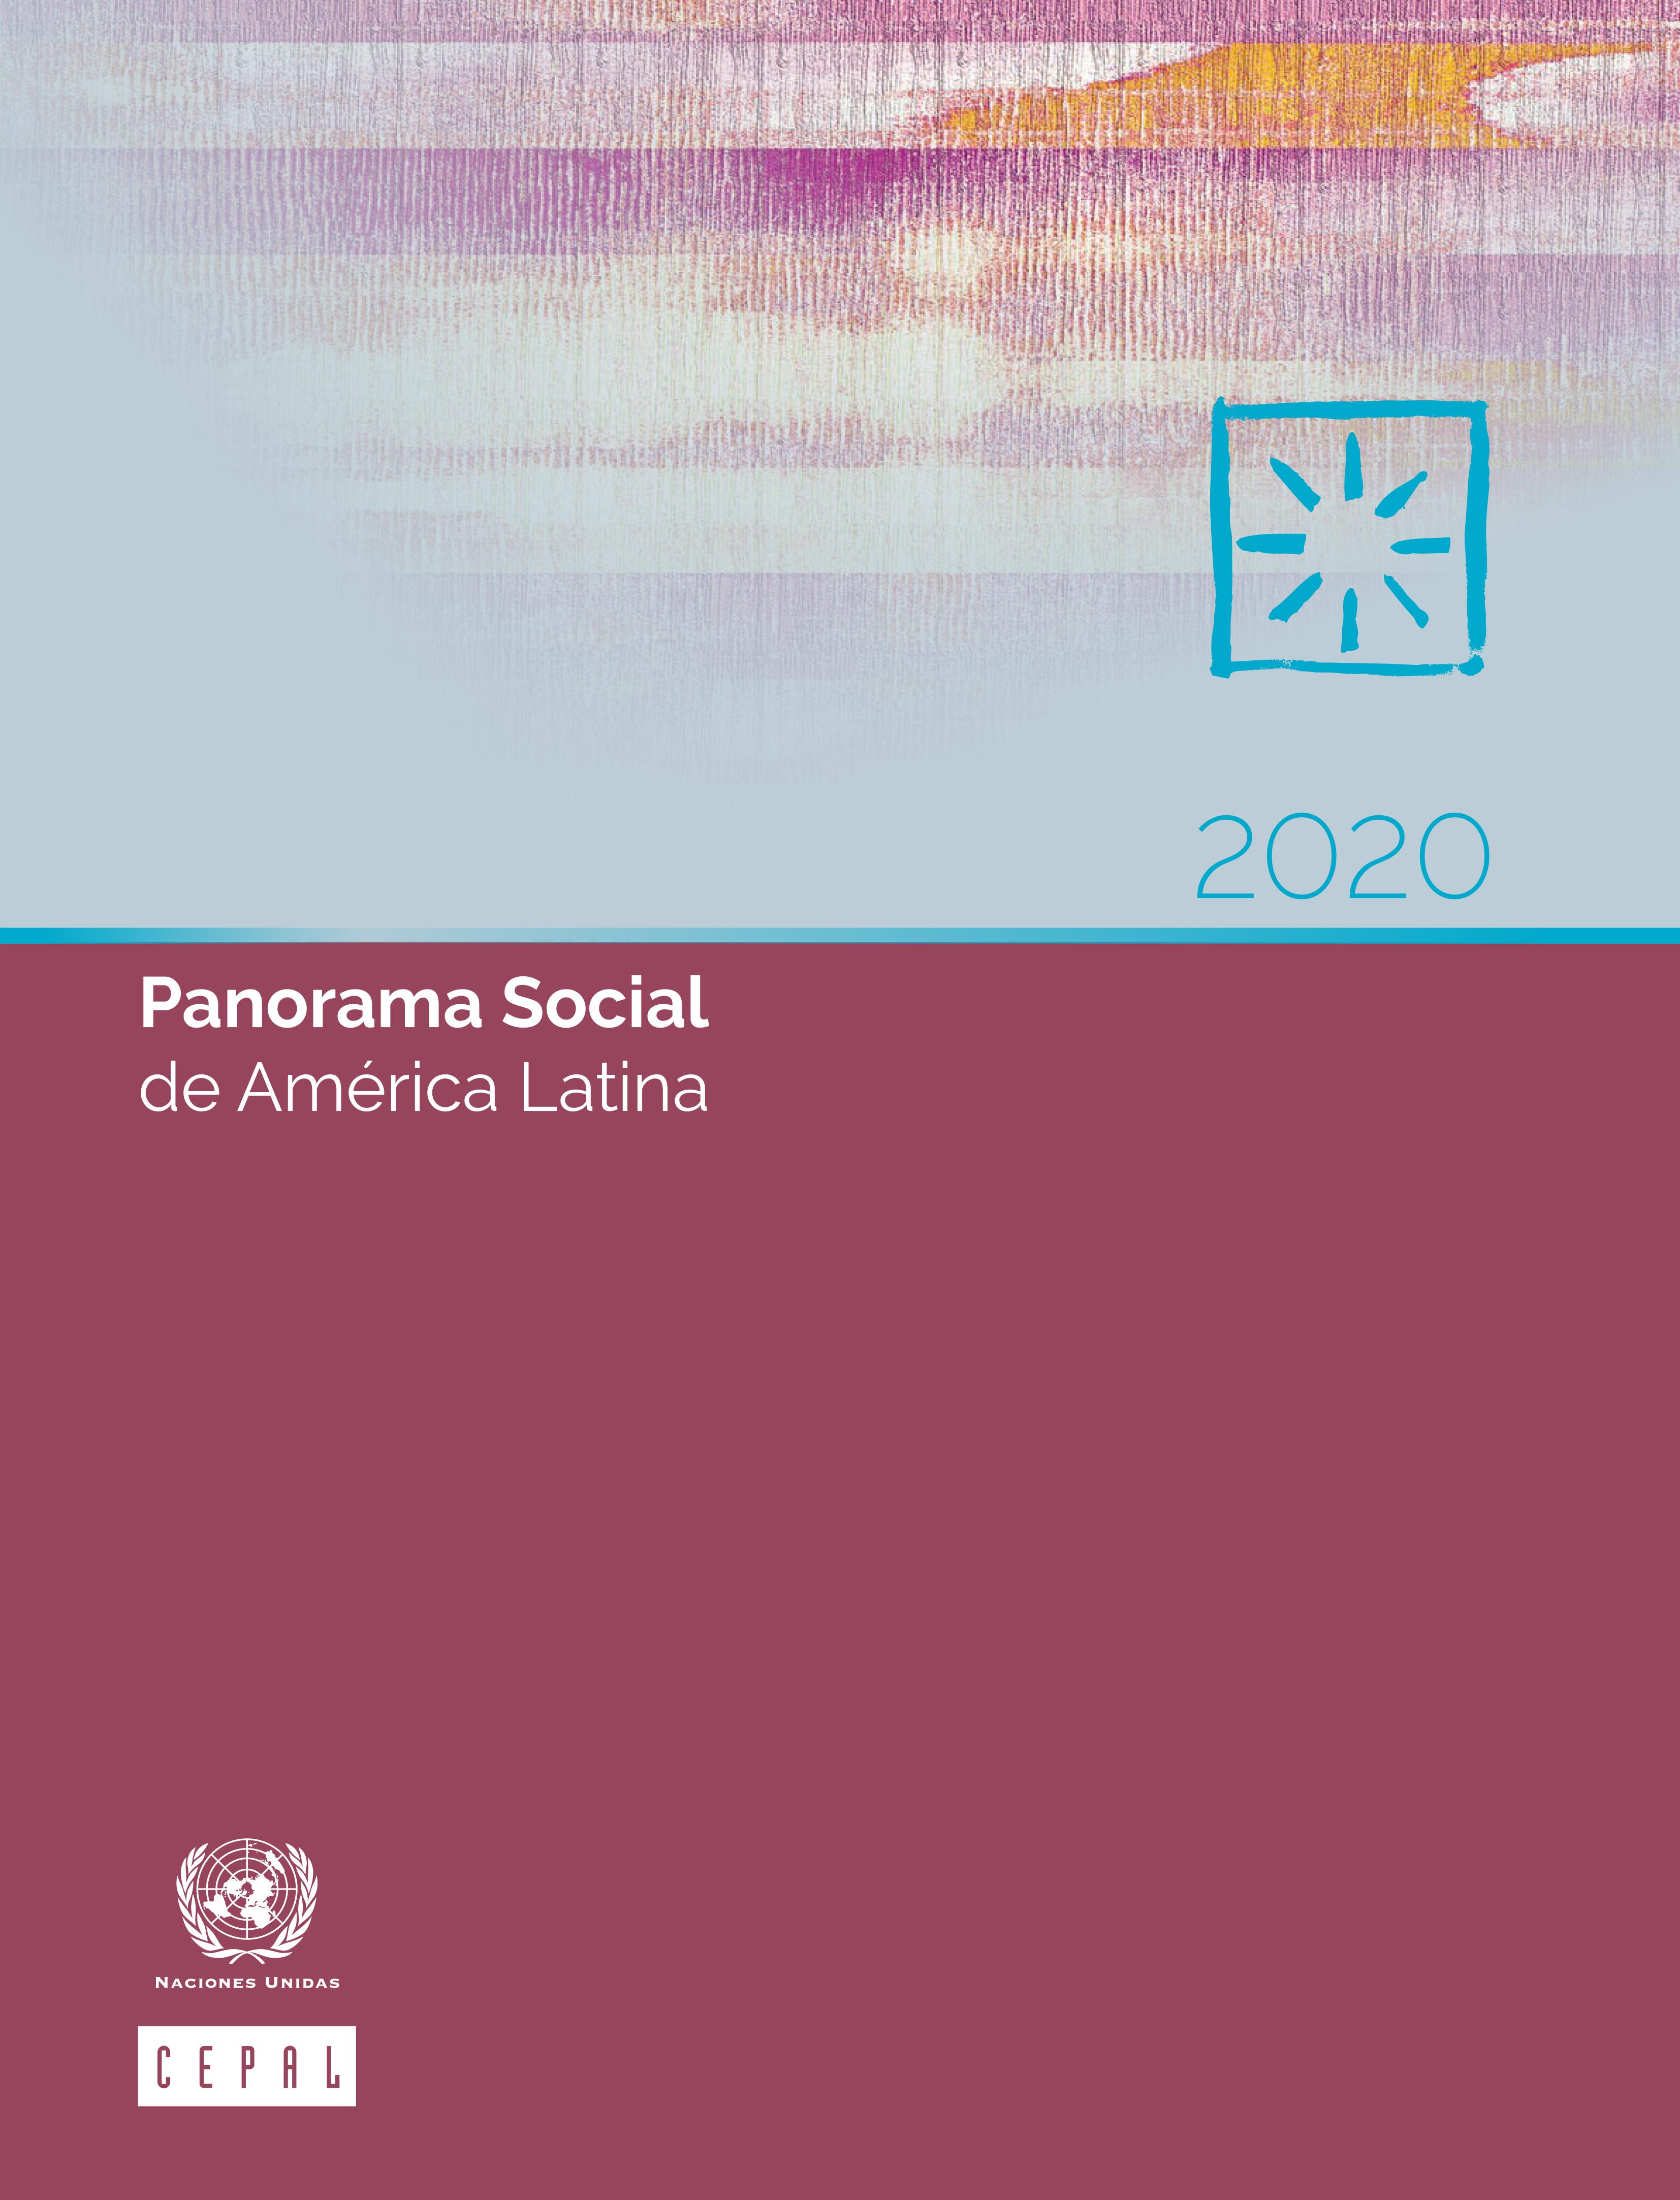 CEPAL PanSoc LAC 2020